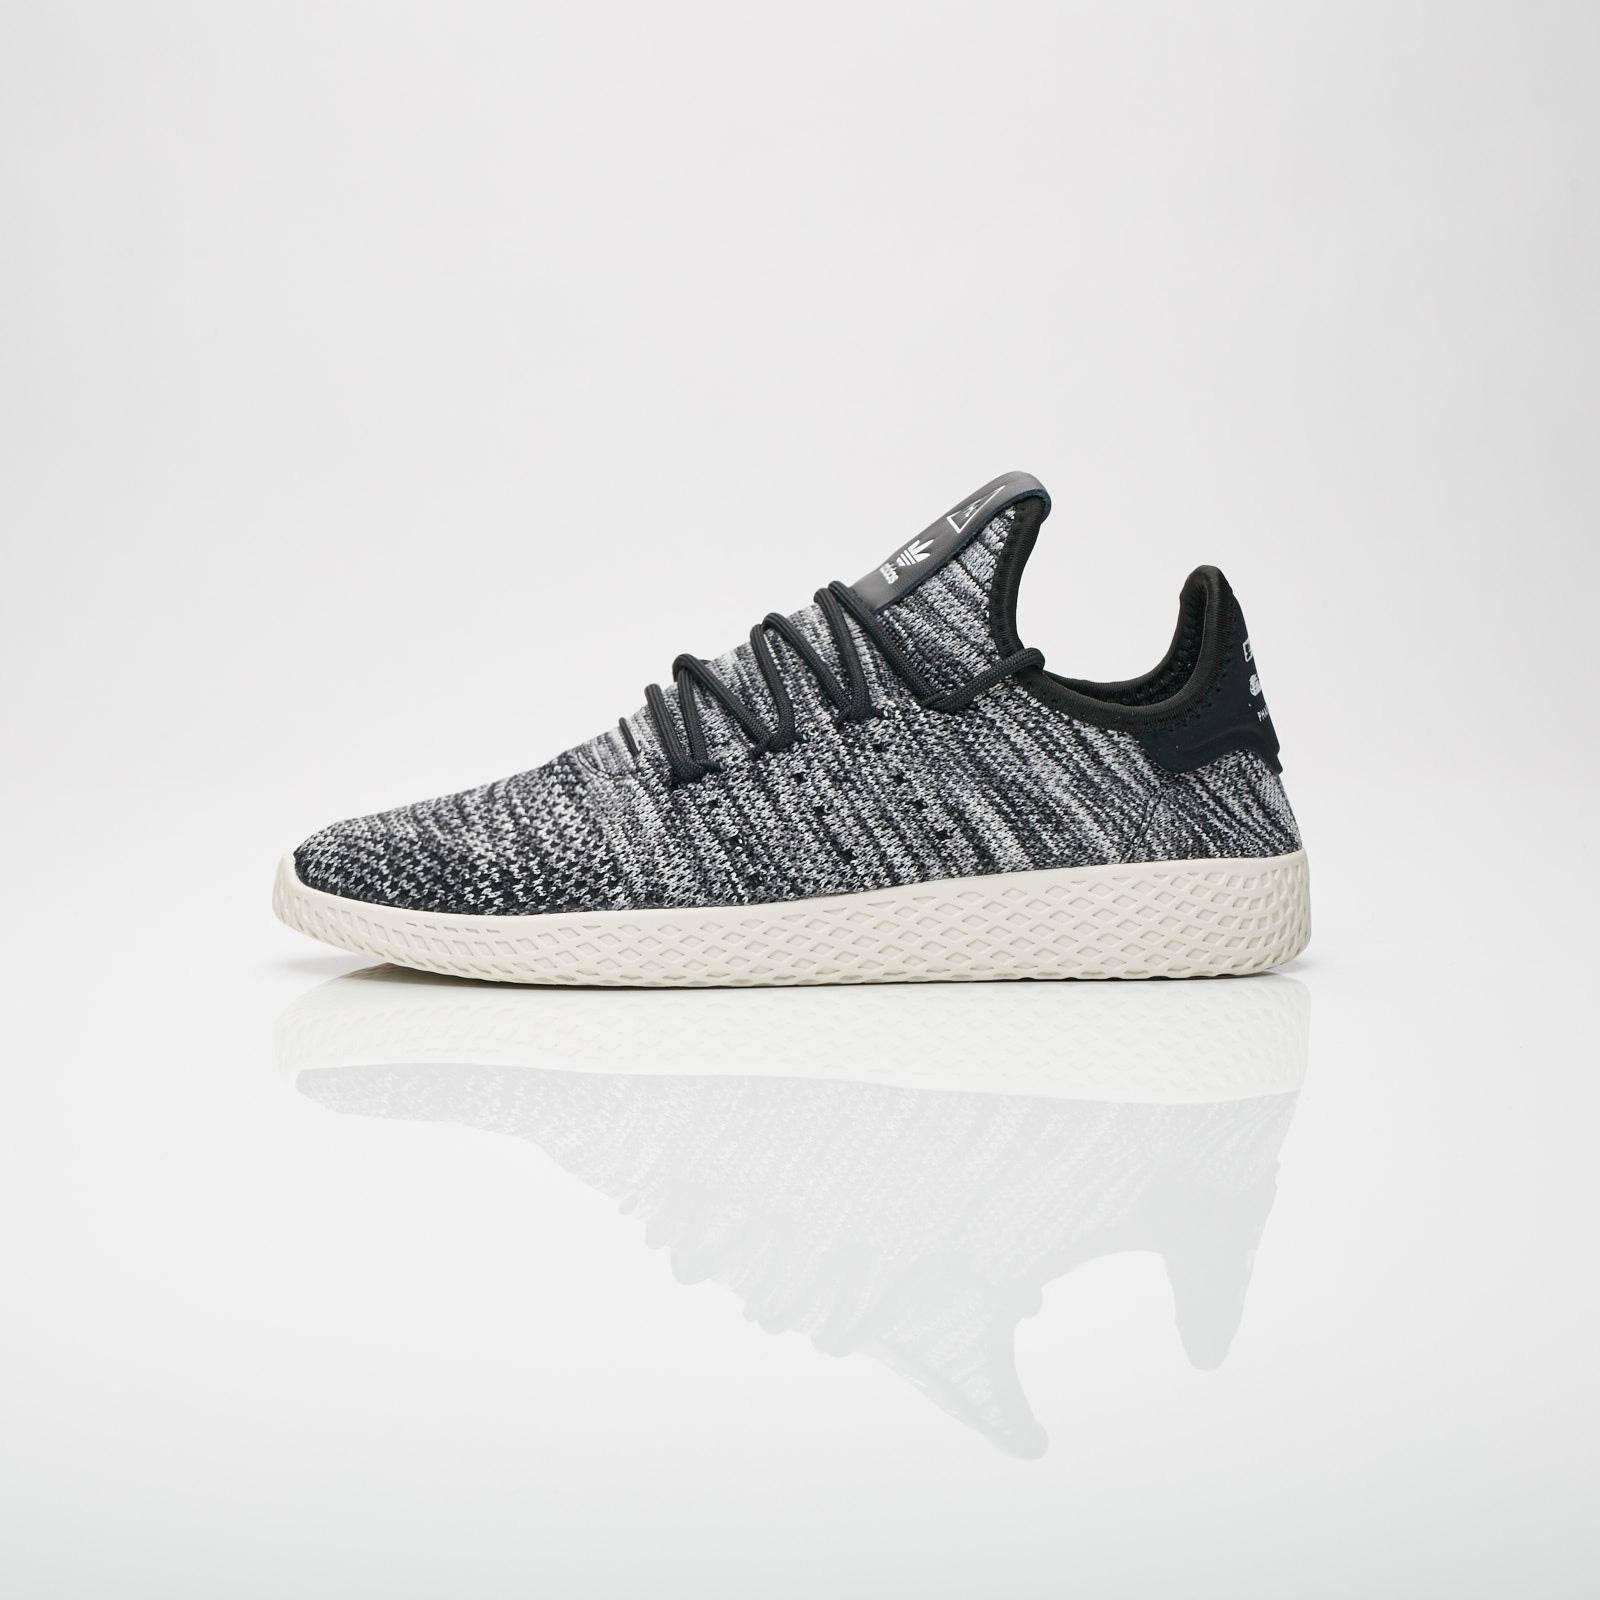 adidas Originals PW Tennis hu PK, Chalk White-Core Black-Footwear White, 4,5